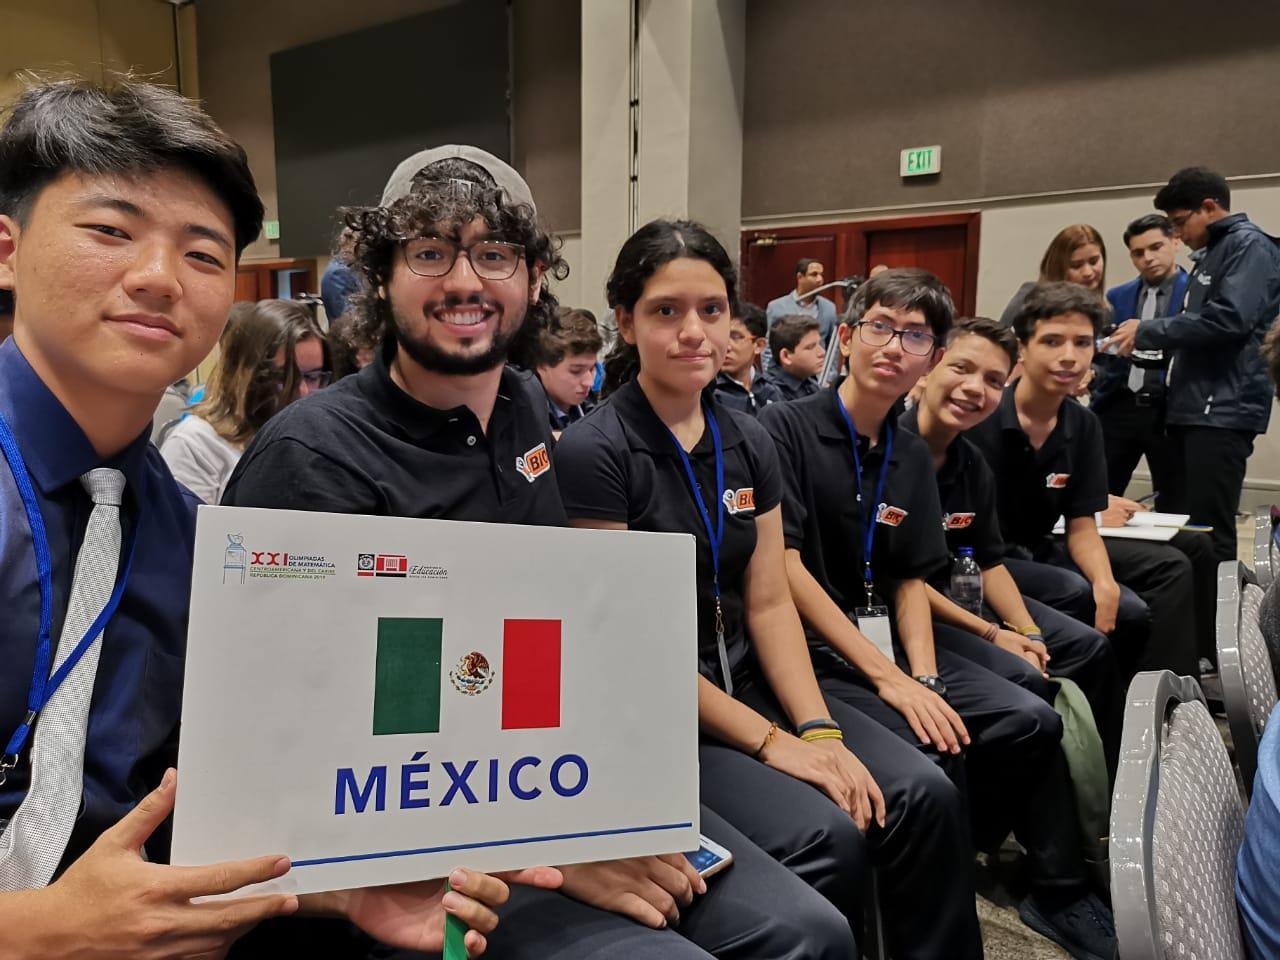 México-campeón11-olimpiada-centroamericana-matemática-UNAMGlobal